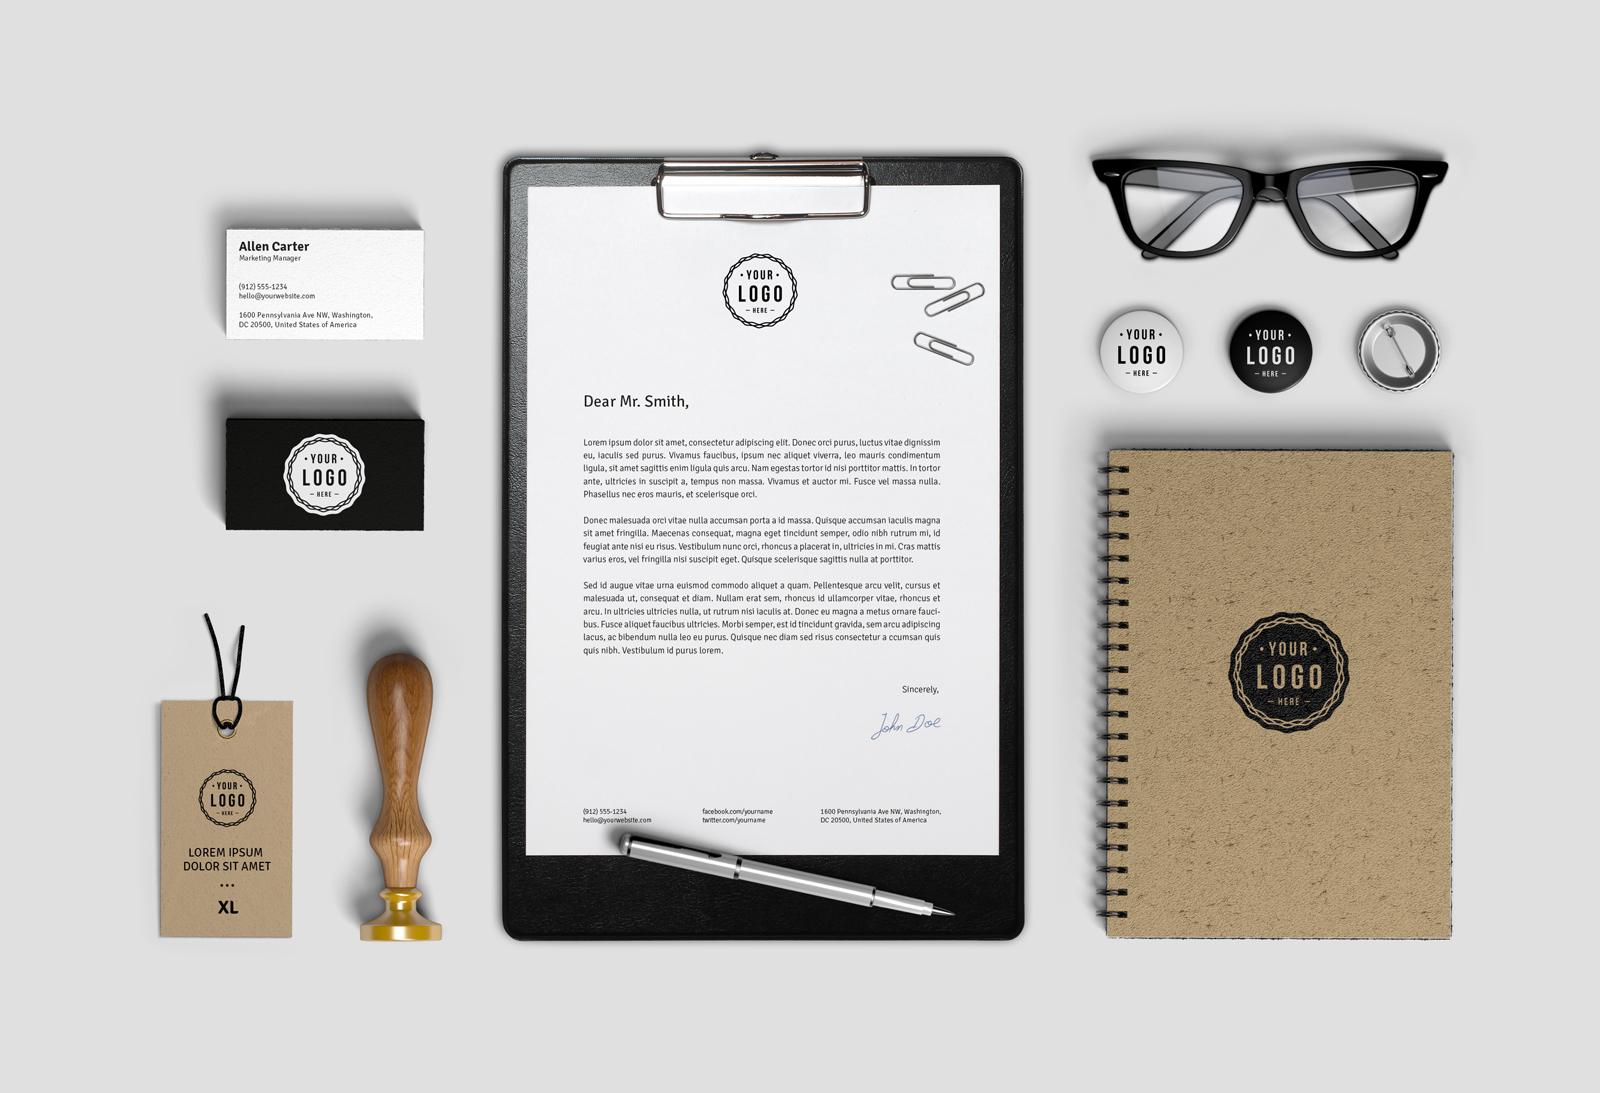 Free-Brand-Identity-Stationery-Mockup-PSD-File-3